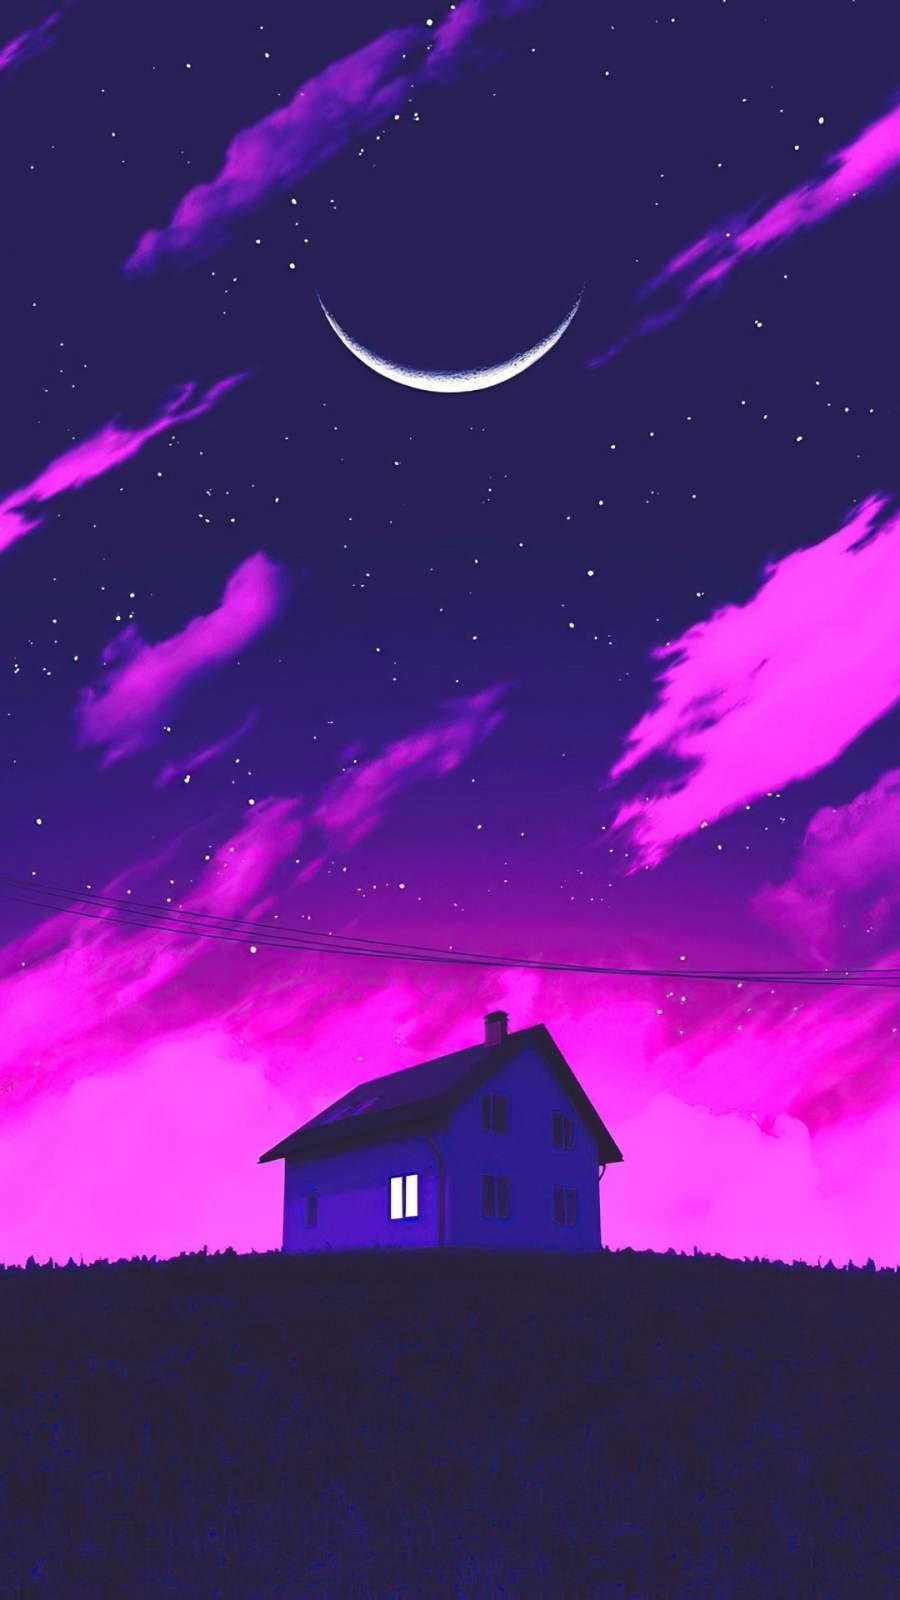 Magical Night iPhone Wallpaper